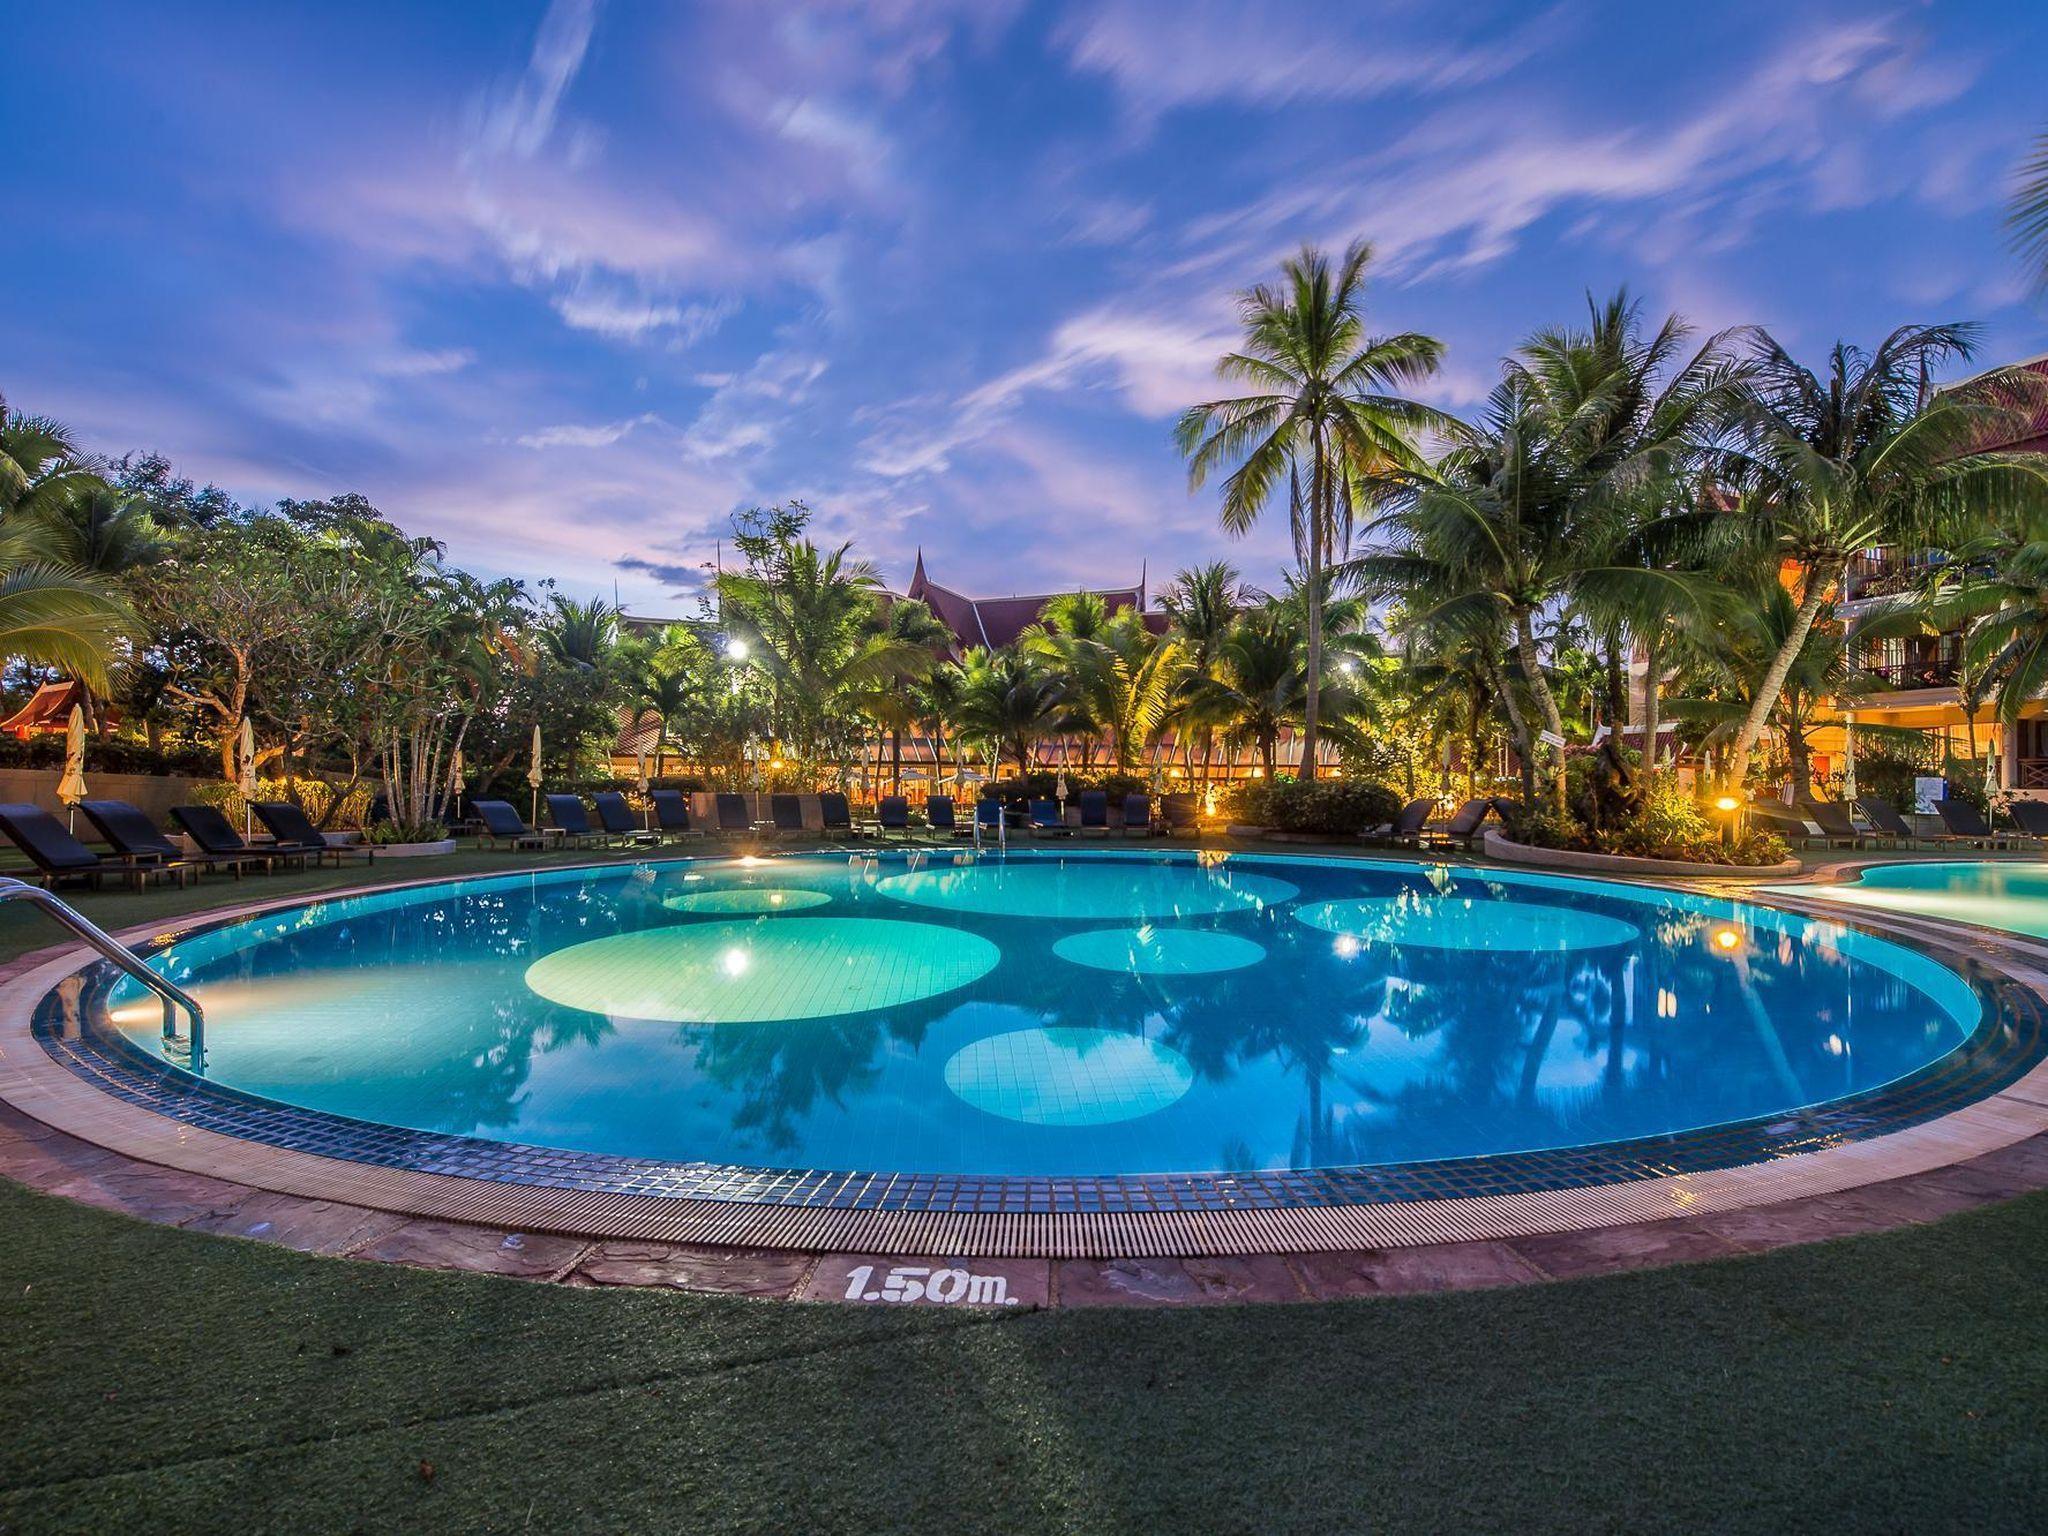 Krabi Hotels A Guide To Hotels In Krabi Thailand